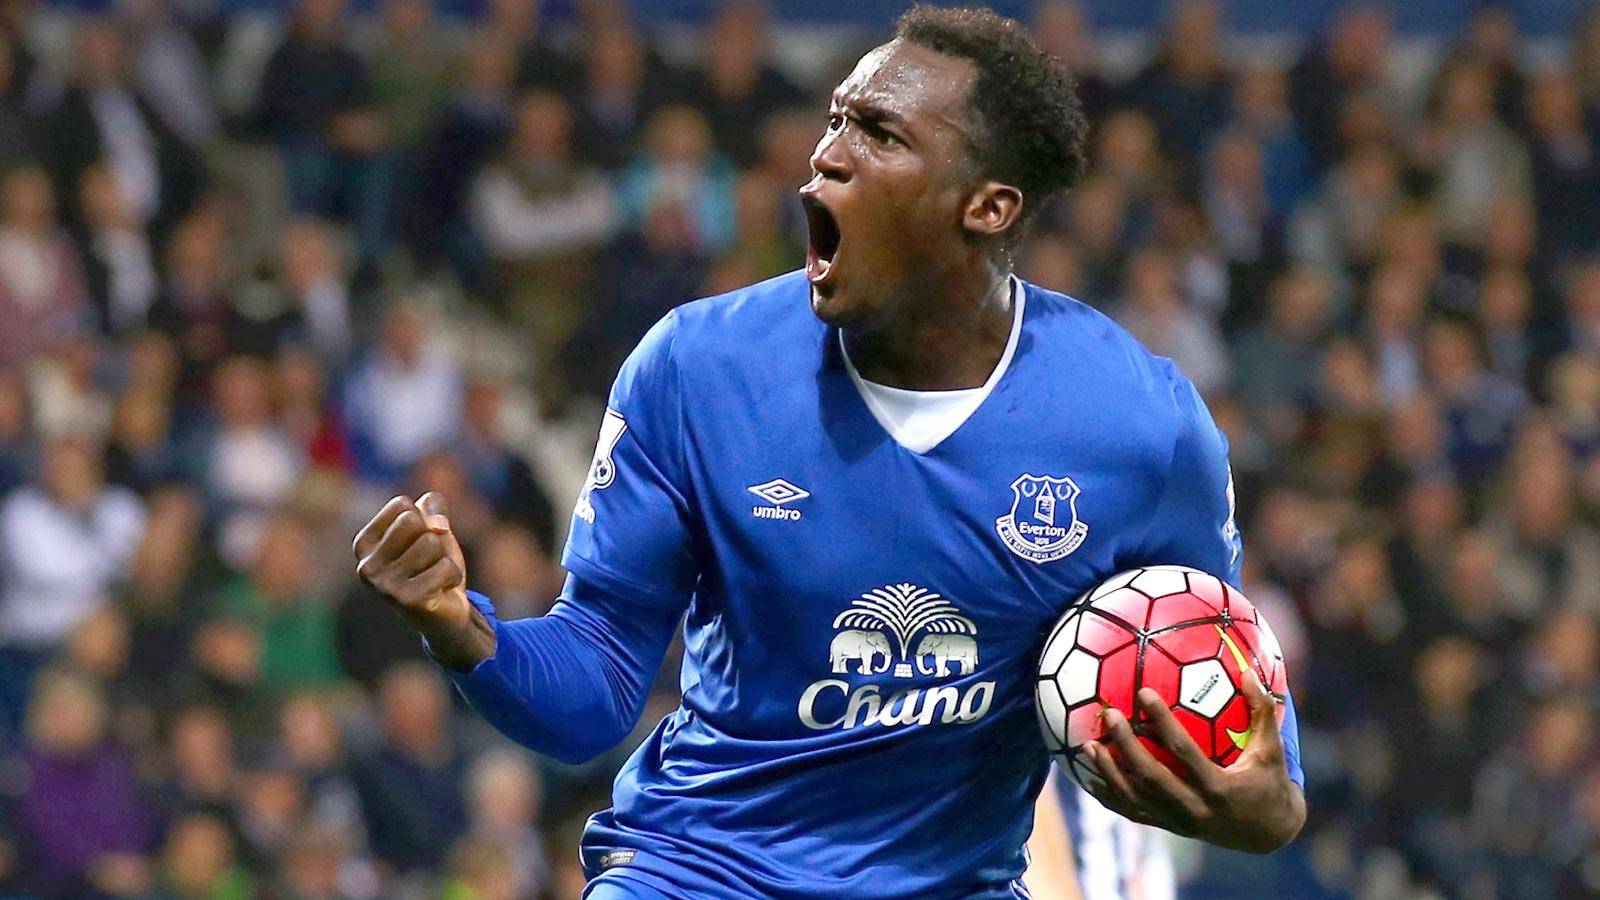 Romelu Lukaku powers Everton to comeback win vs. West Brom